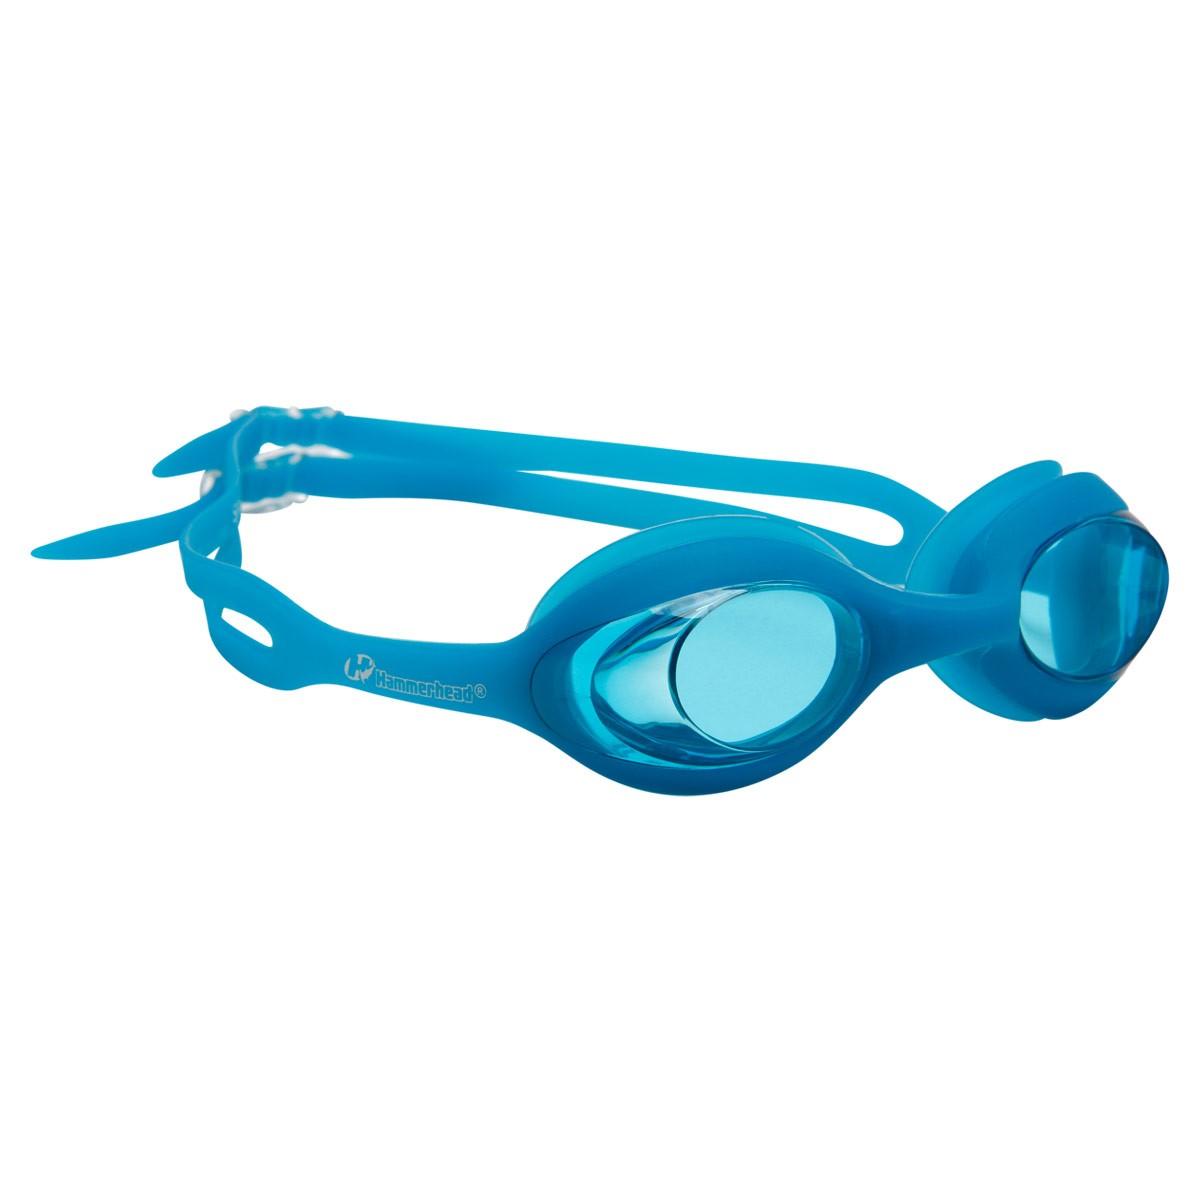 Óculos infantil para Natação Hammerhead  Spectrum Júnior Azul